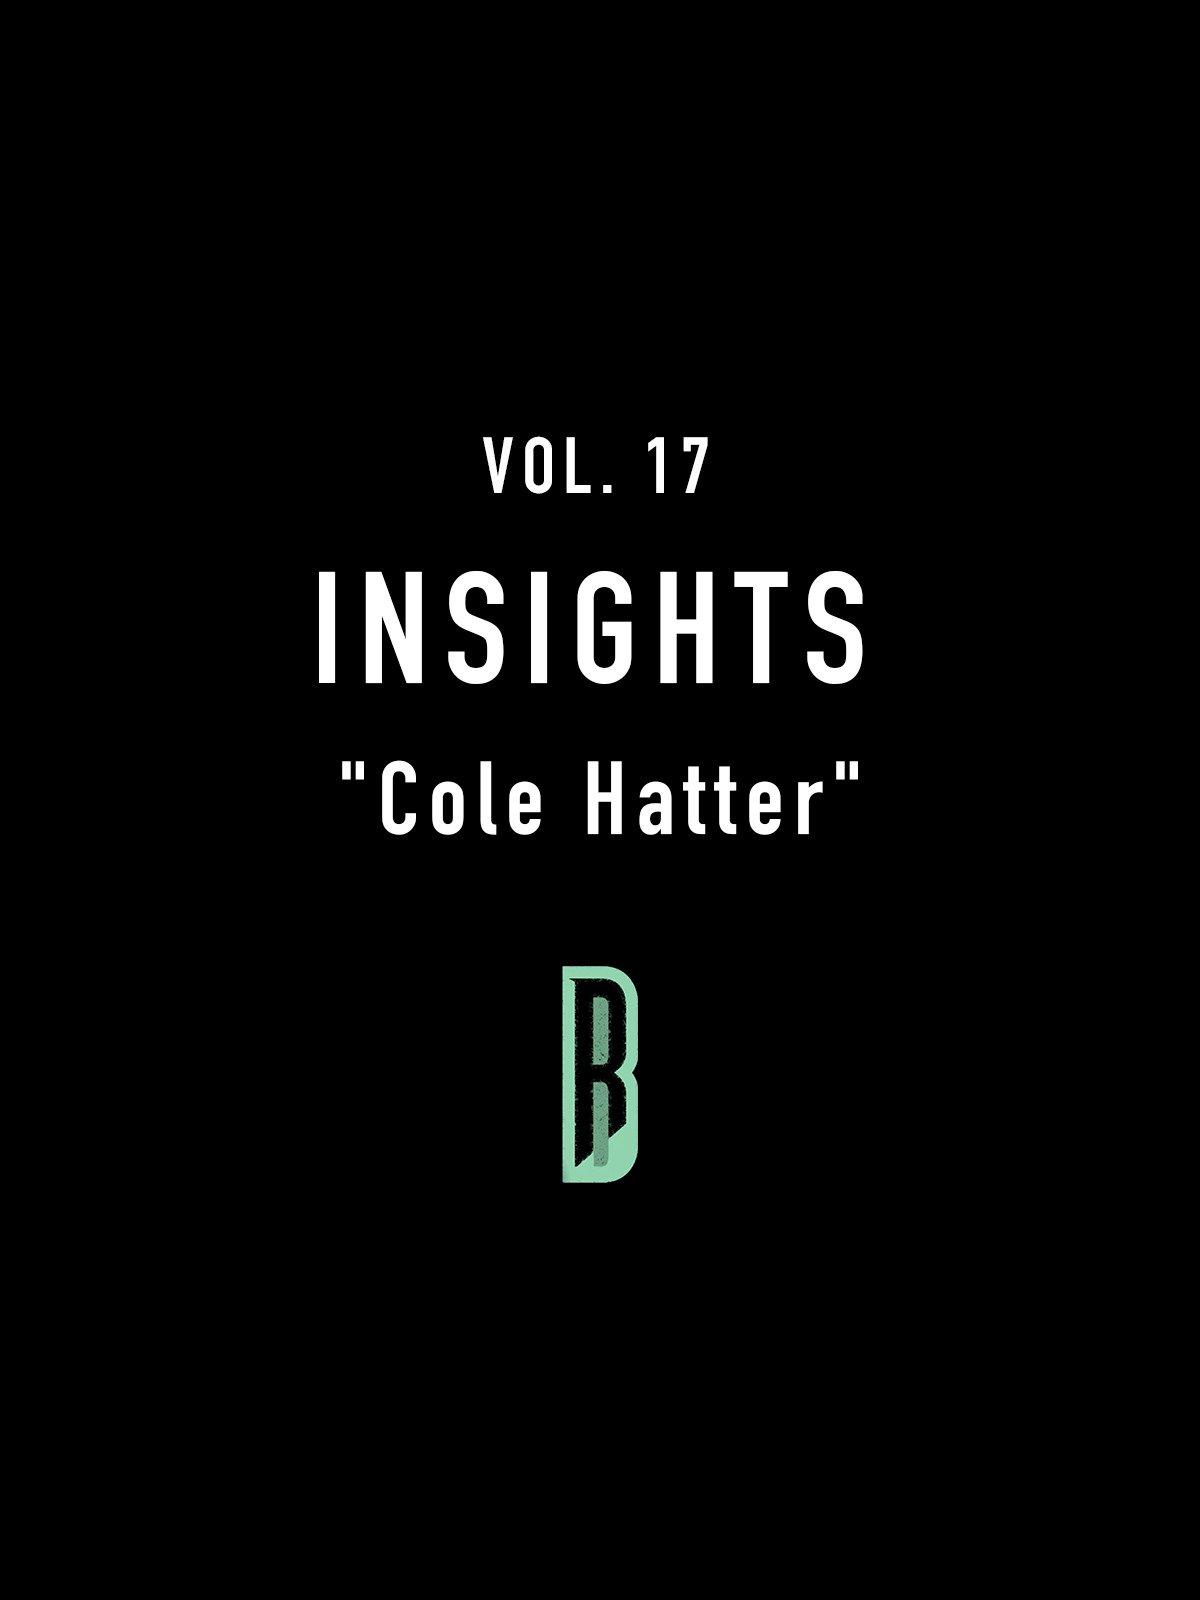 Insights Vol. 17